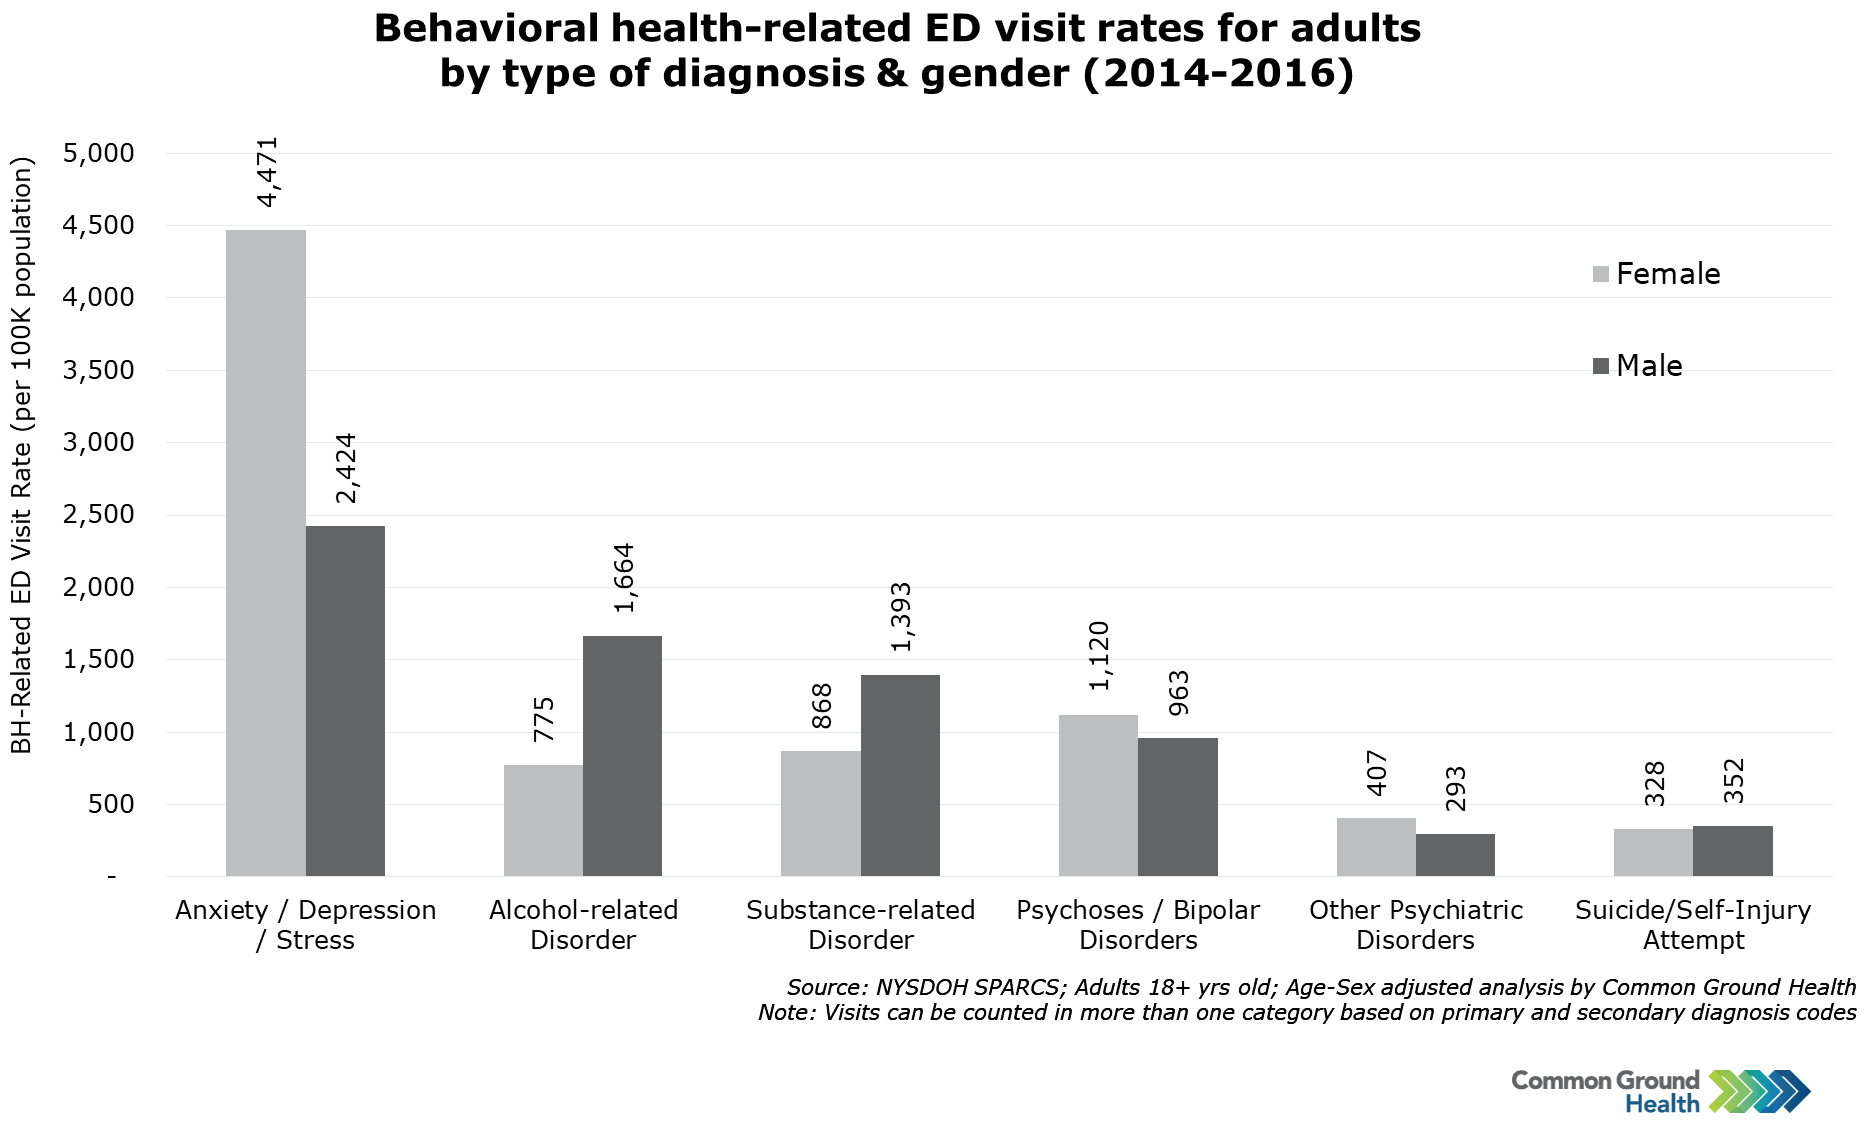 Behavioral Health-Related ED Visit Rate, Diagnosis & Gender